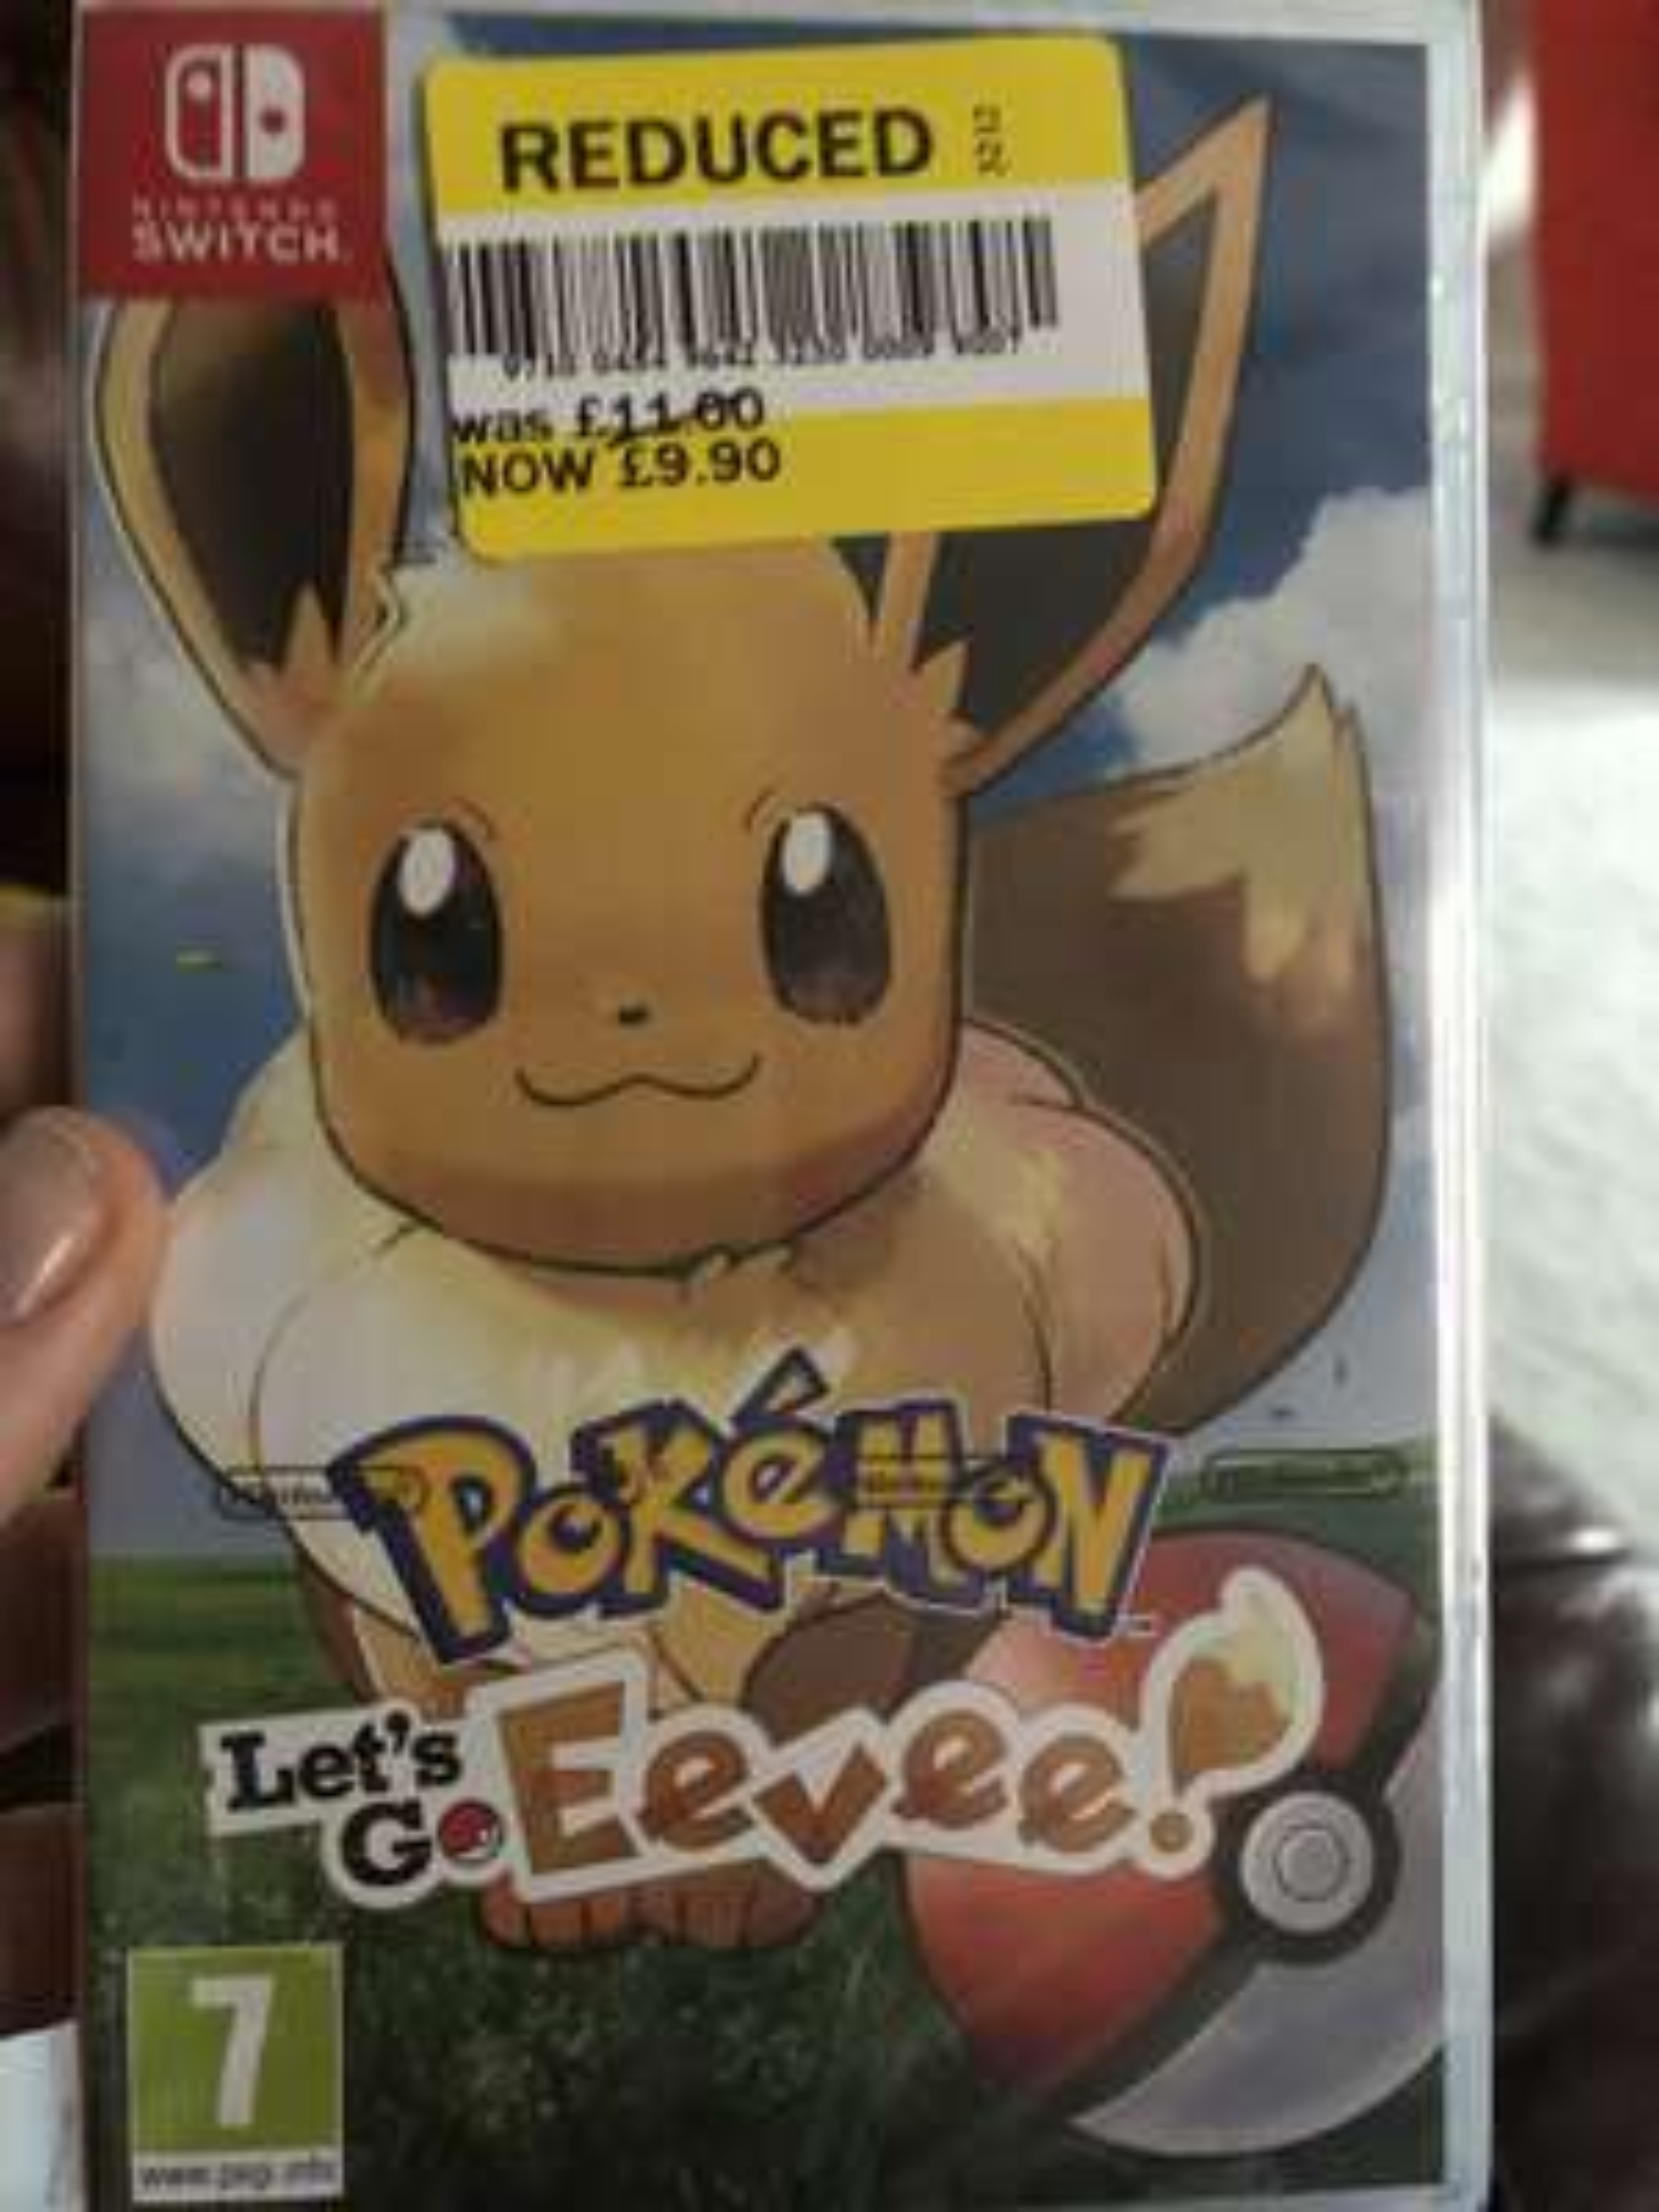 Let's Go Eevee Pokemon Switch £9.90 at Tesco Stratford Upon Avon